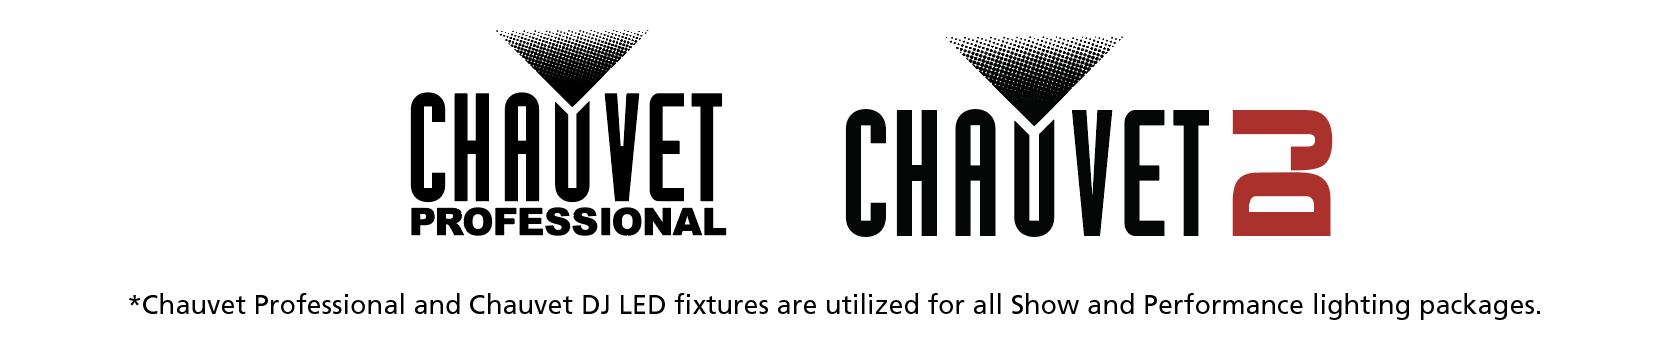 Chauvet Professional and Chauvet DJ  LED